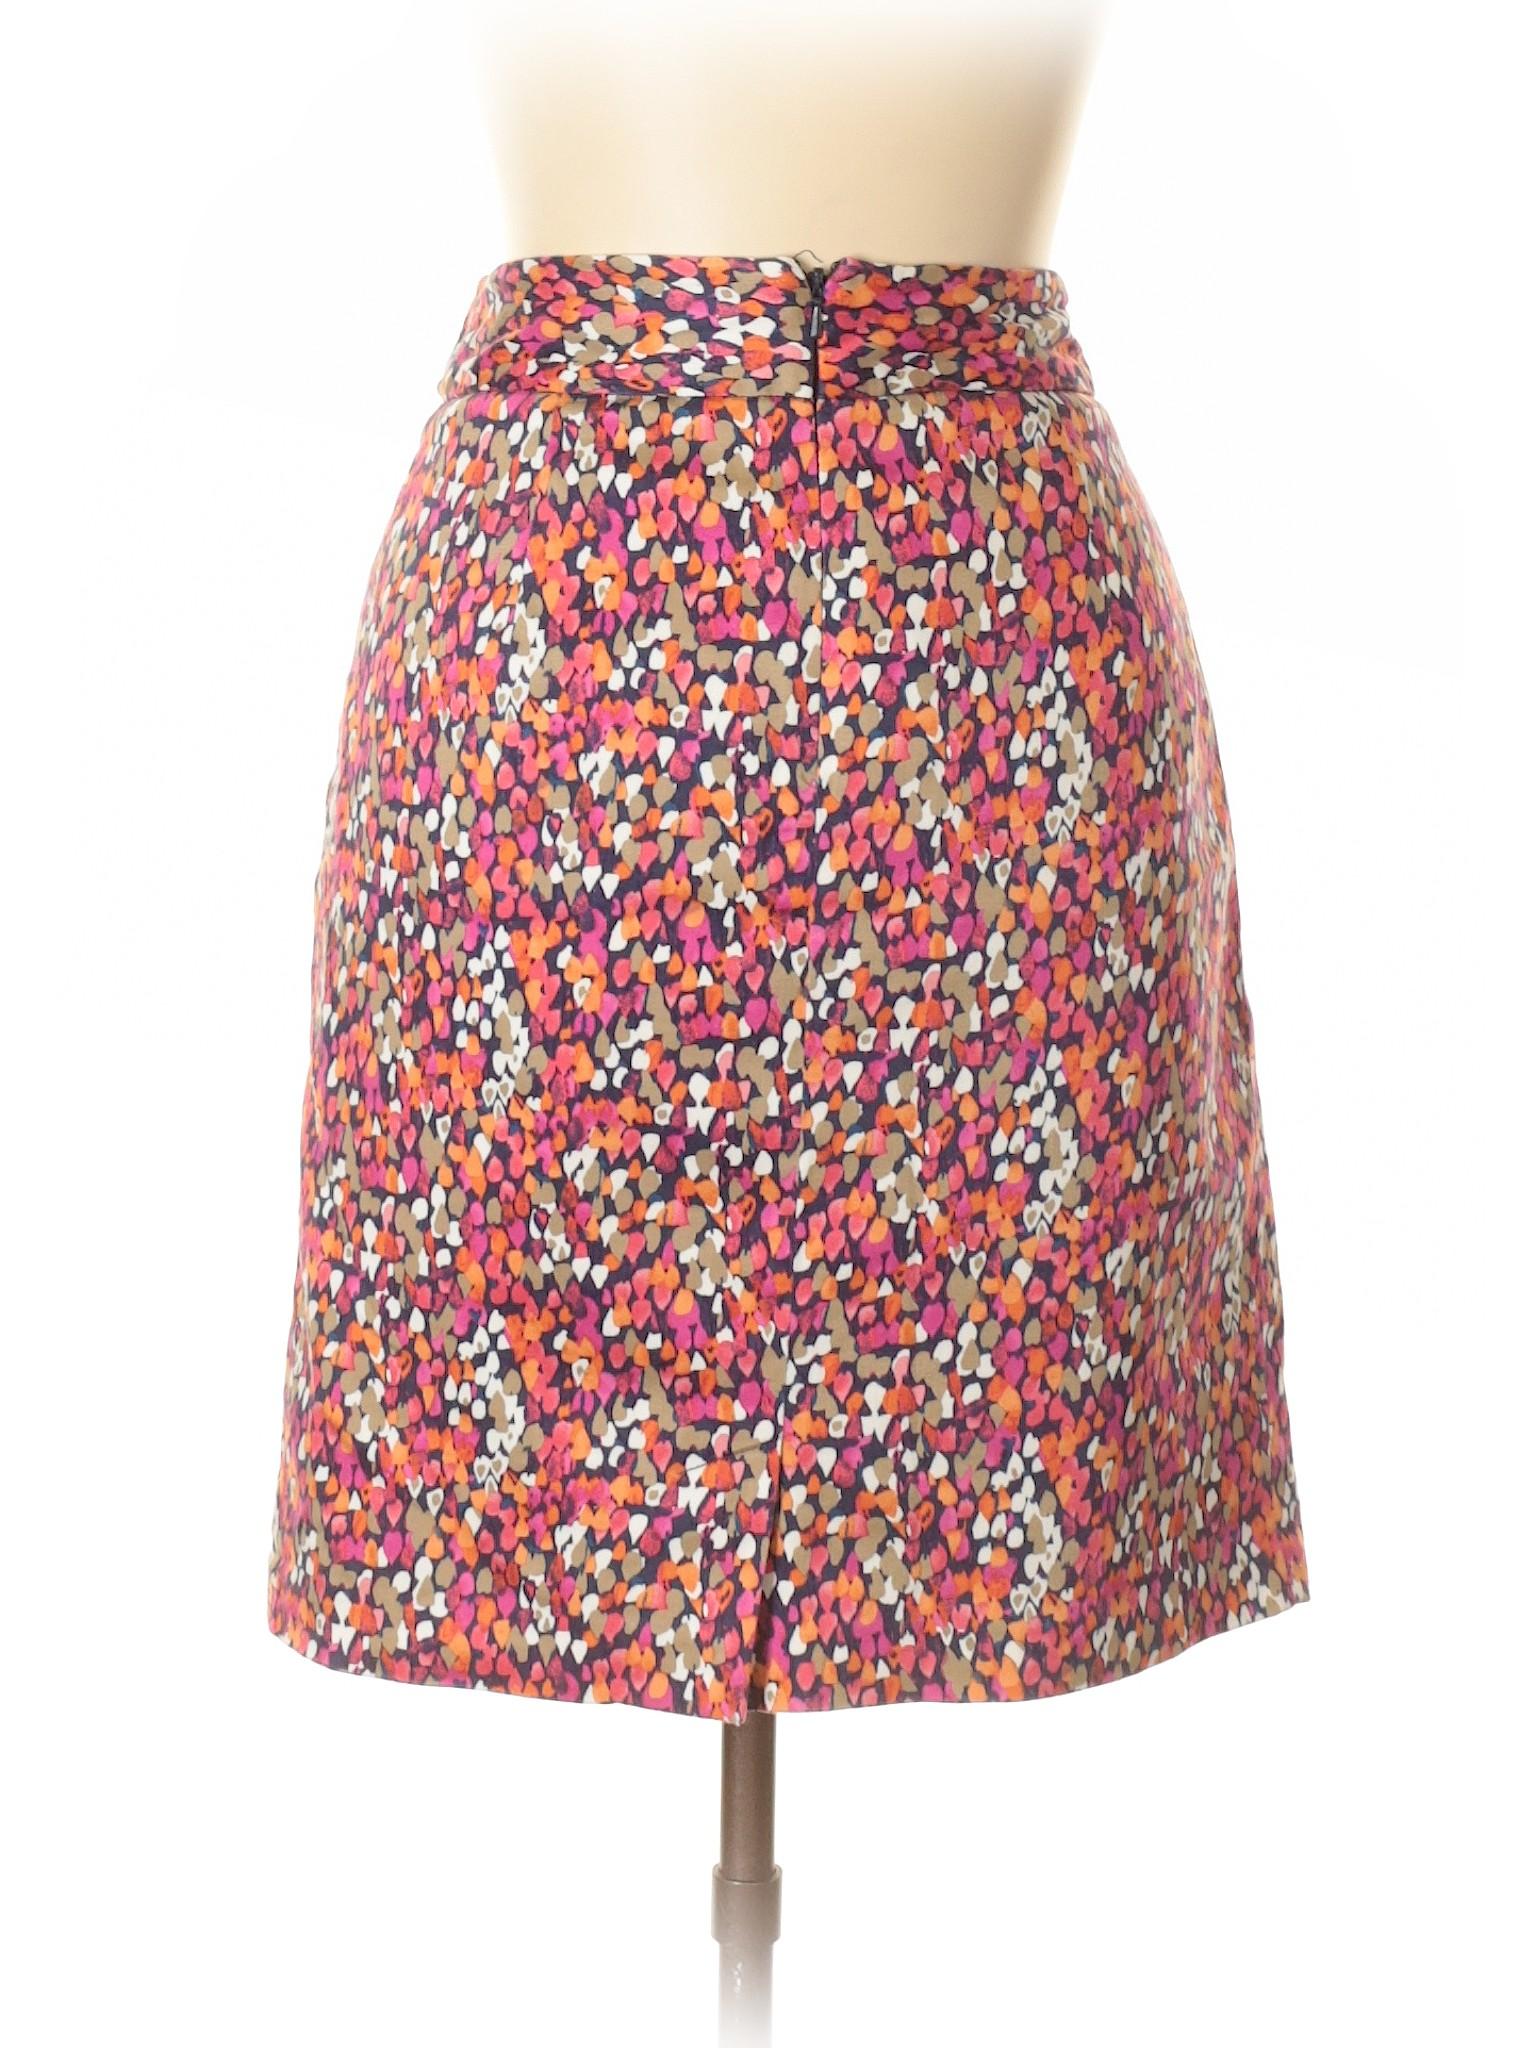 Skirt Casual Boutique Skirt Casual Boutique Rdw6tZxtq